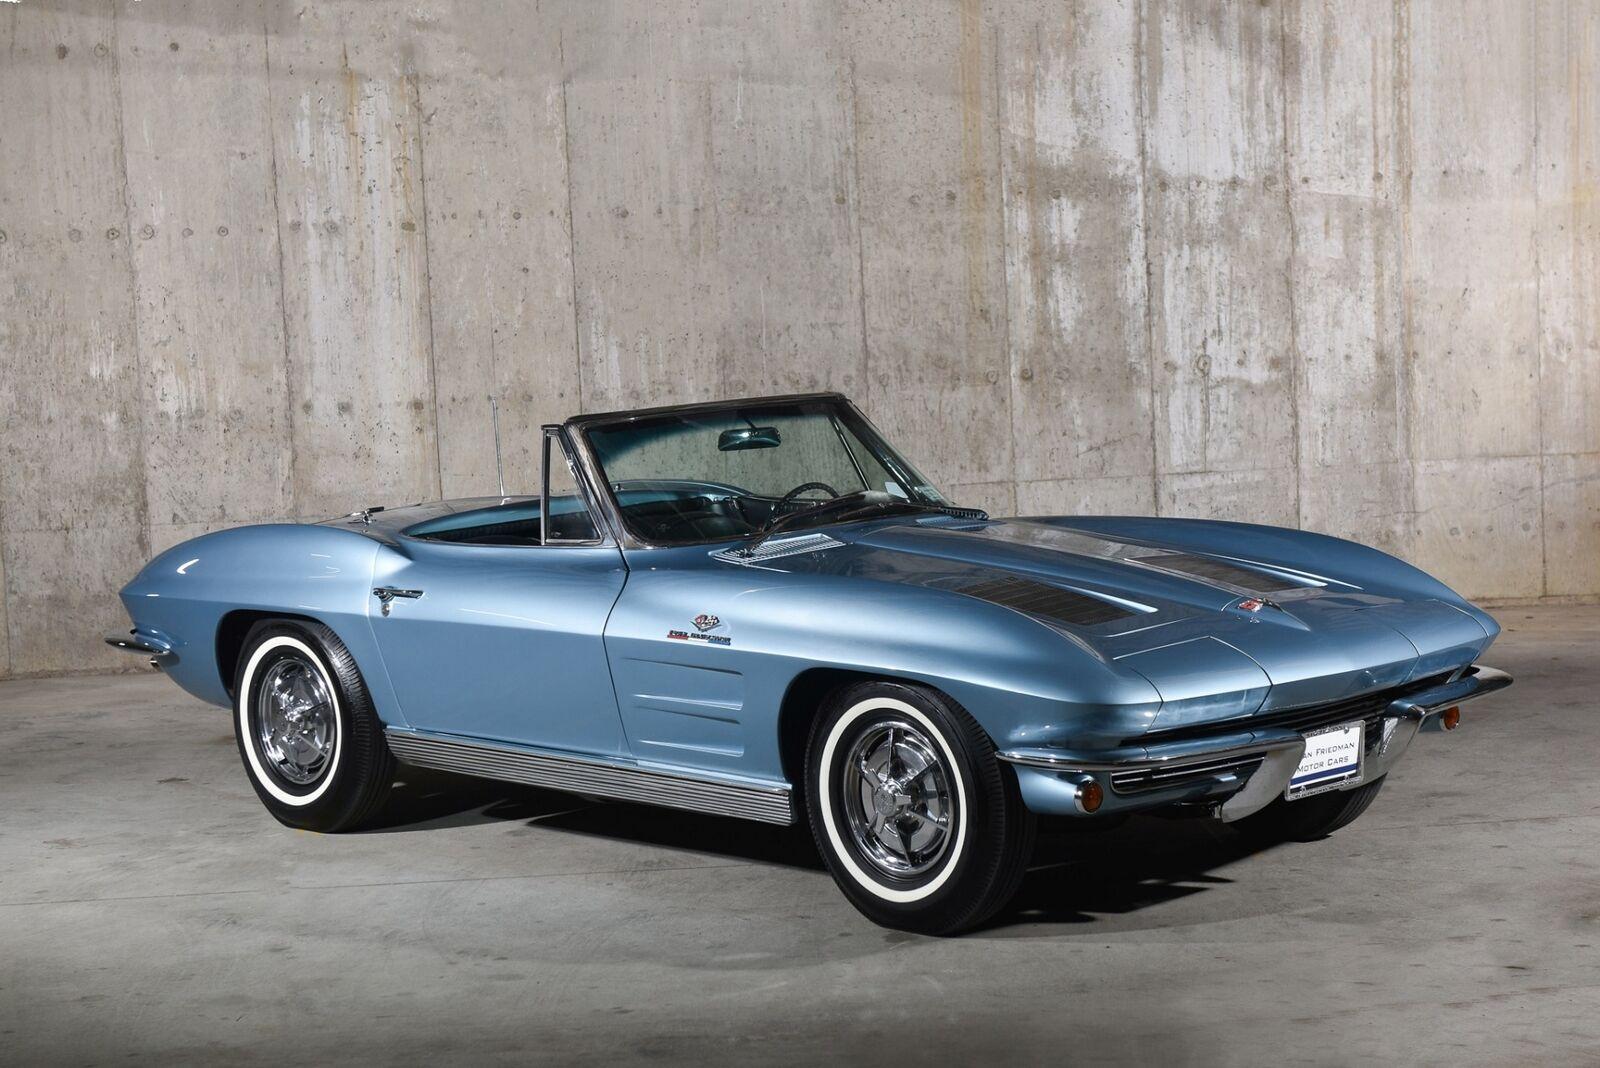 1963 Blue Chevrolet Corvette   | C2 Corvette Photo 2